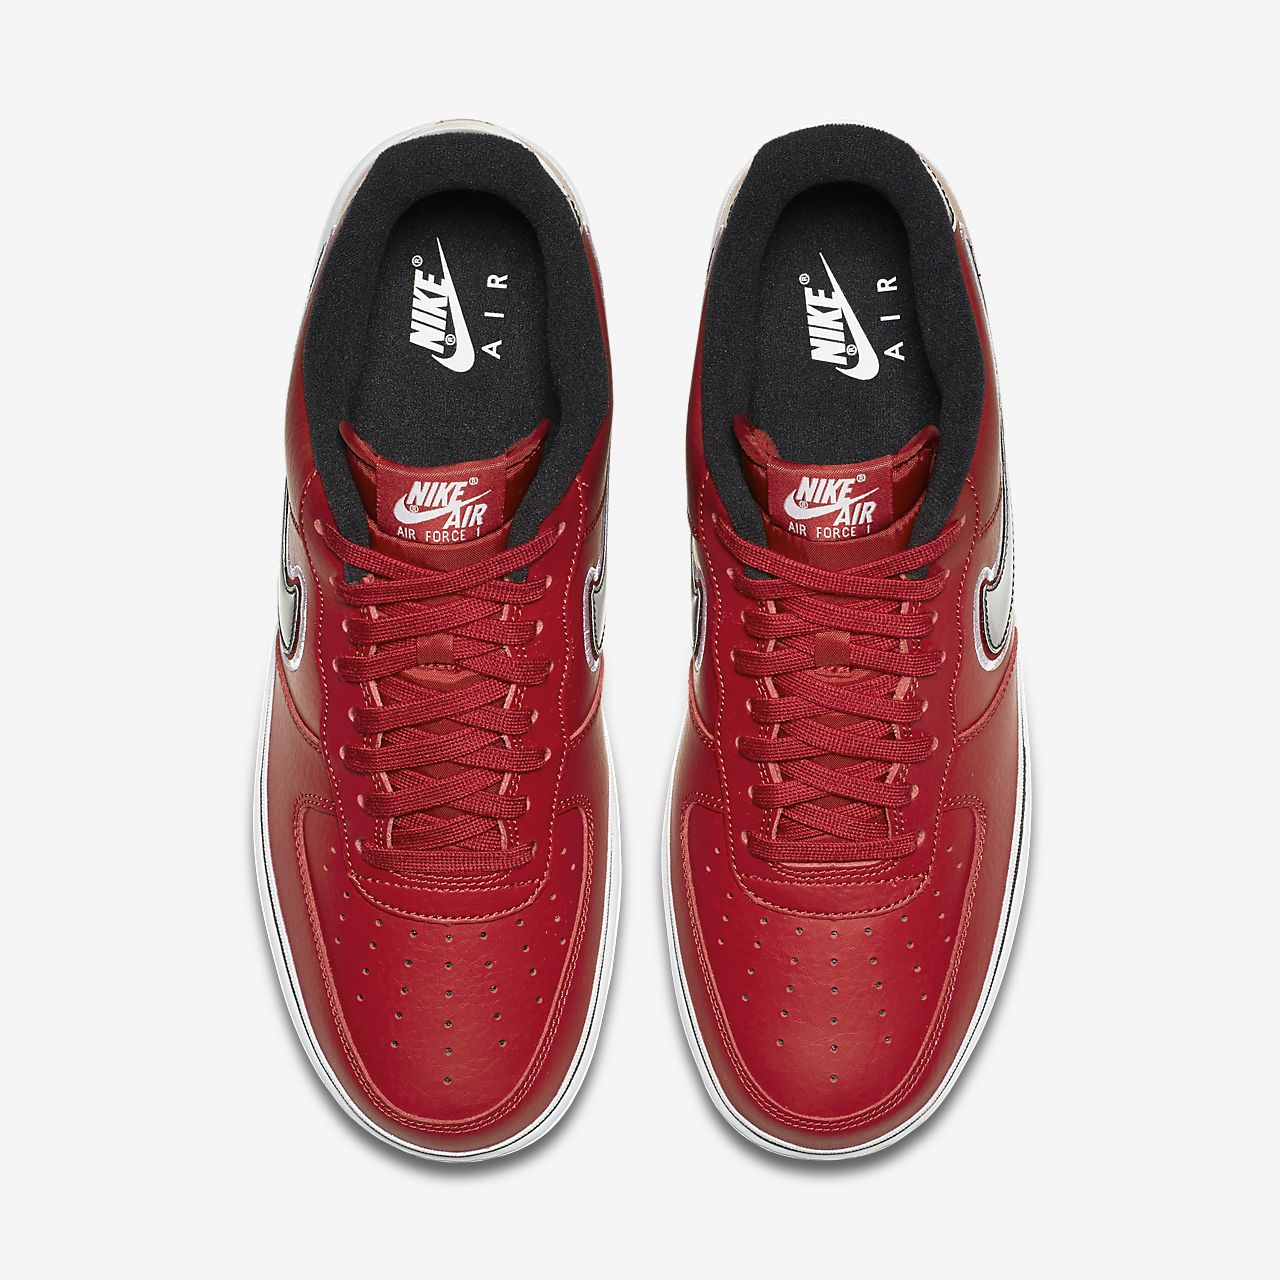 5537a379c1a Nike Air Force 1 NBA Low (Chicago Bulls) Men s Shoe. Nike.com IL